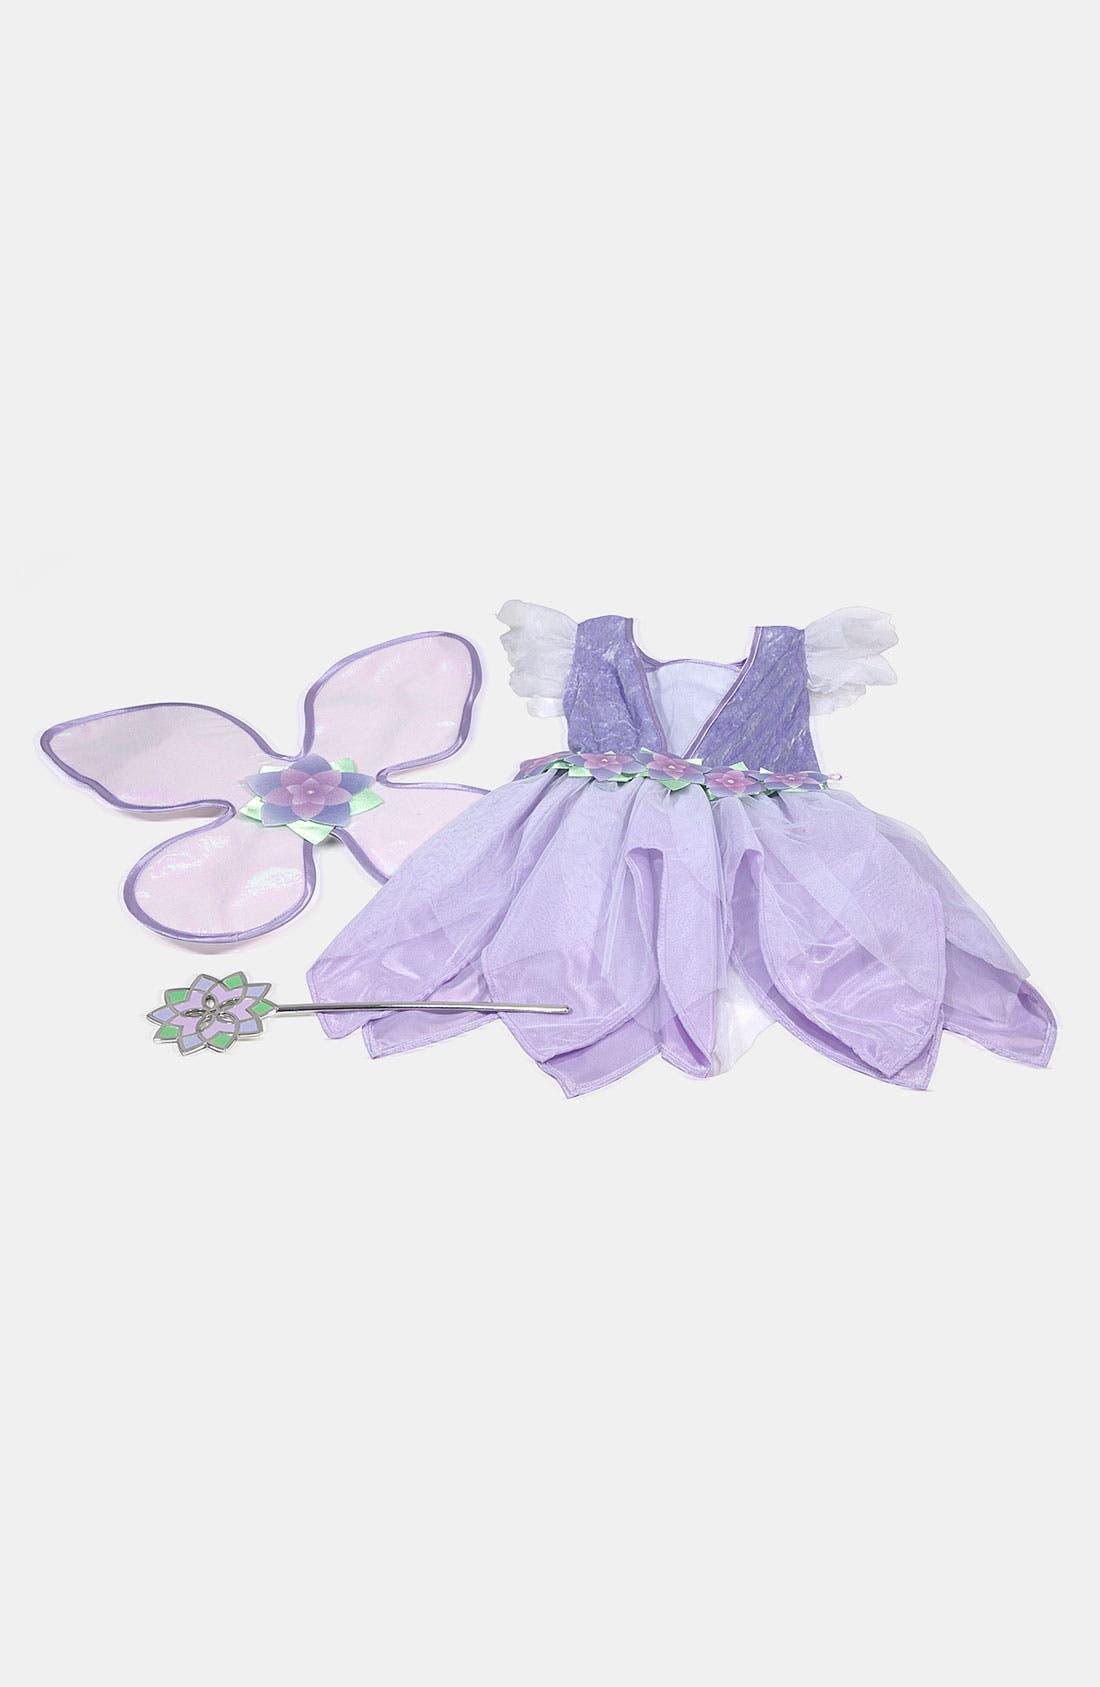 'Fairy' Costume,                             Alternate thumbnail 2, color,                             960